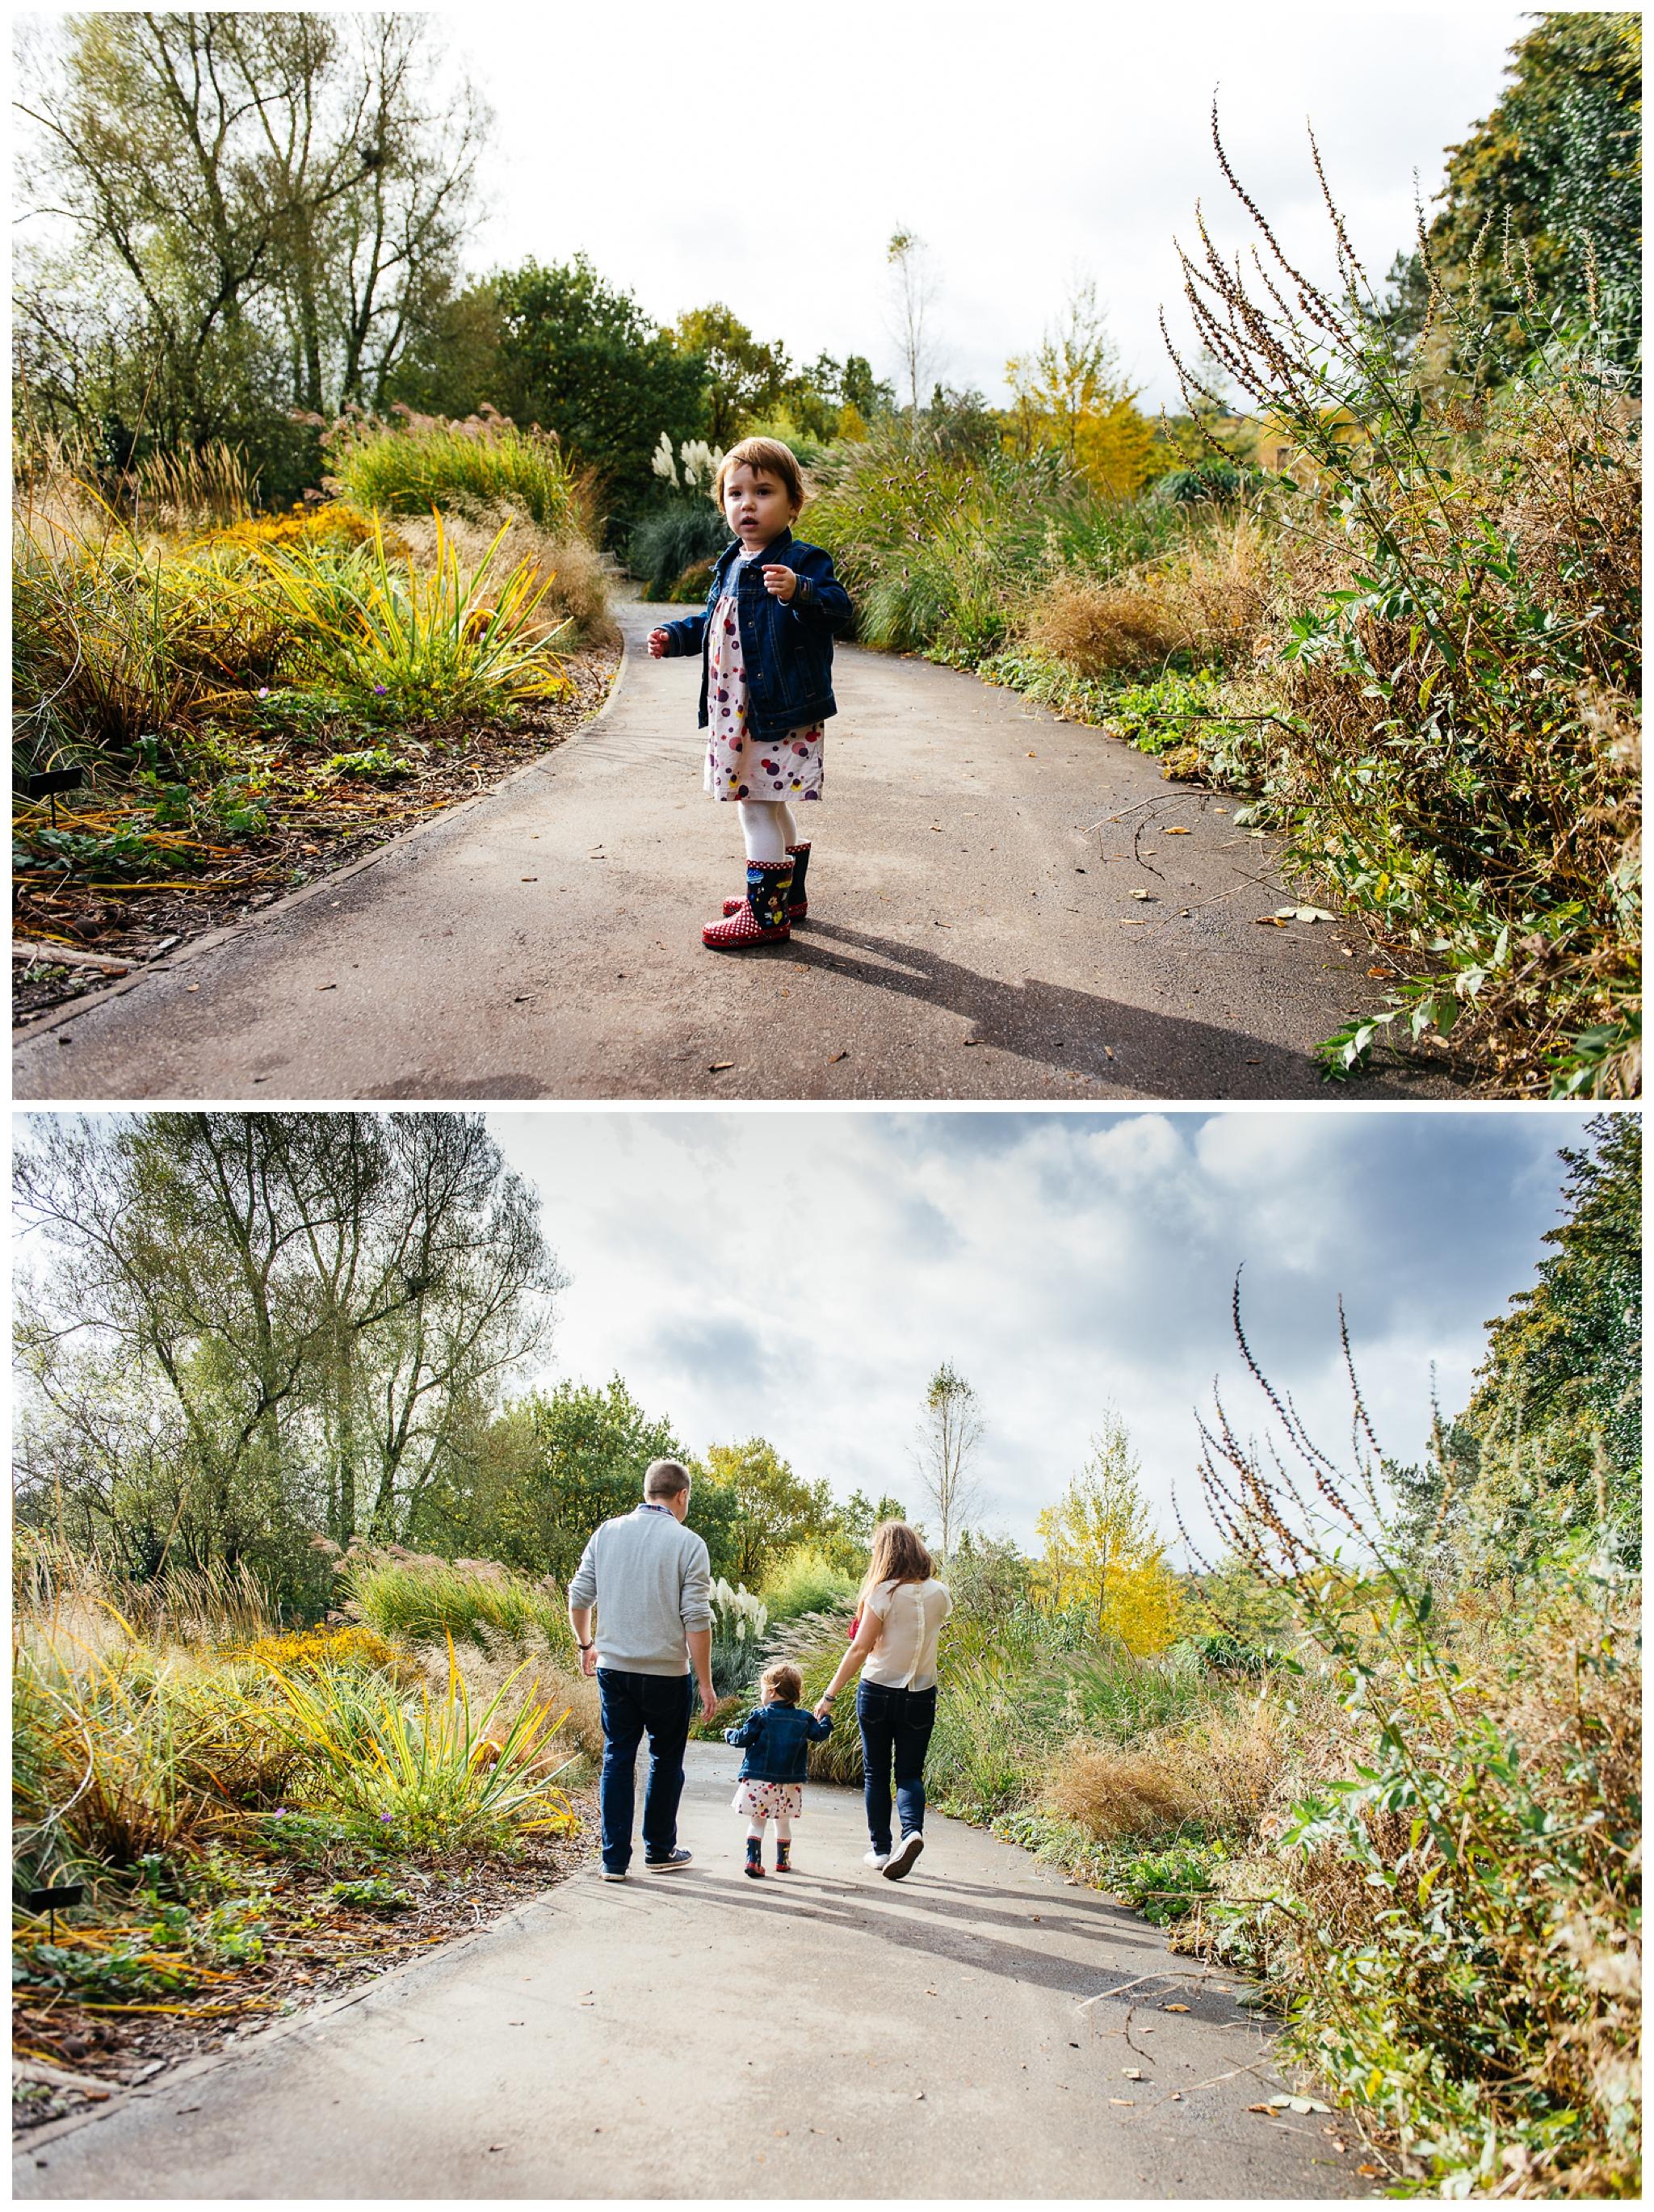 Autumn-family-portraits-birmingham-photographer_0030.jpg